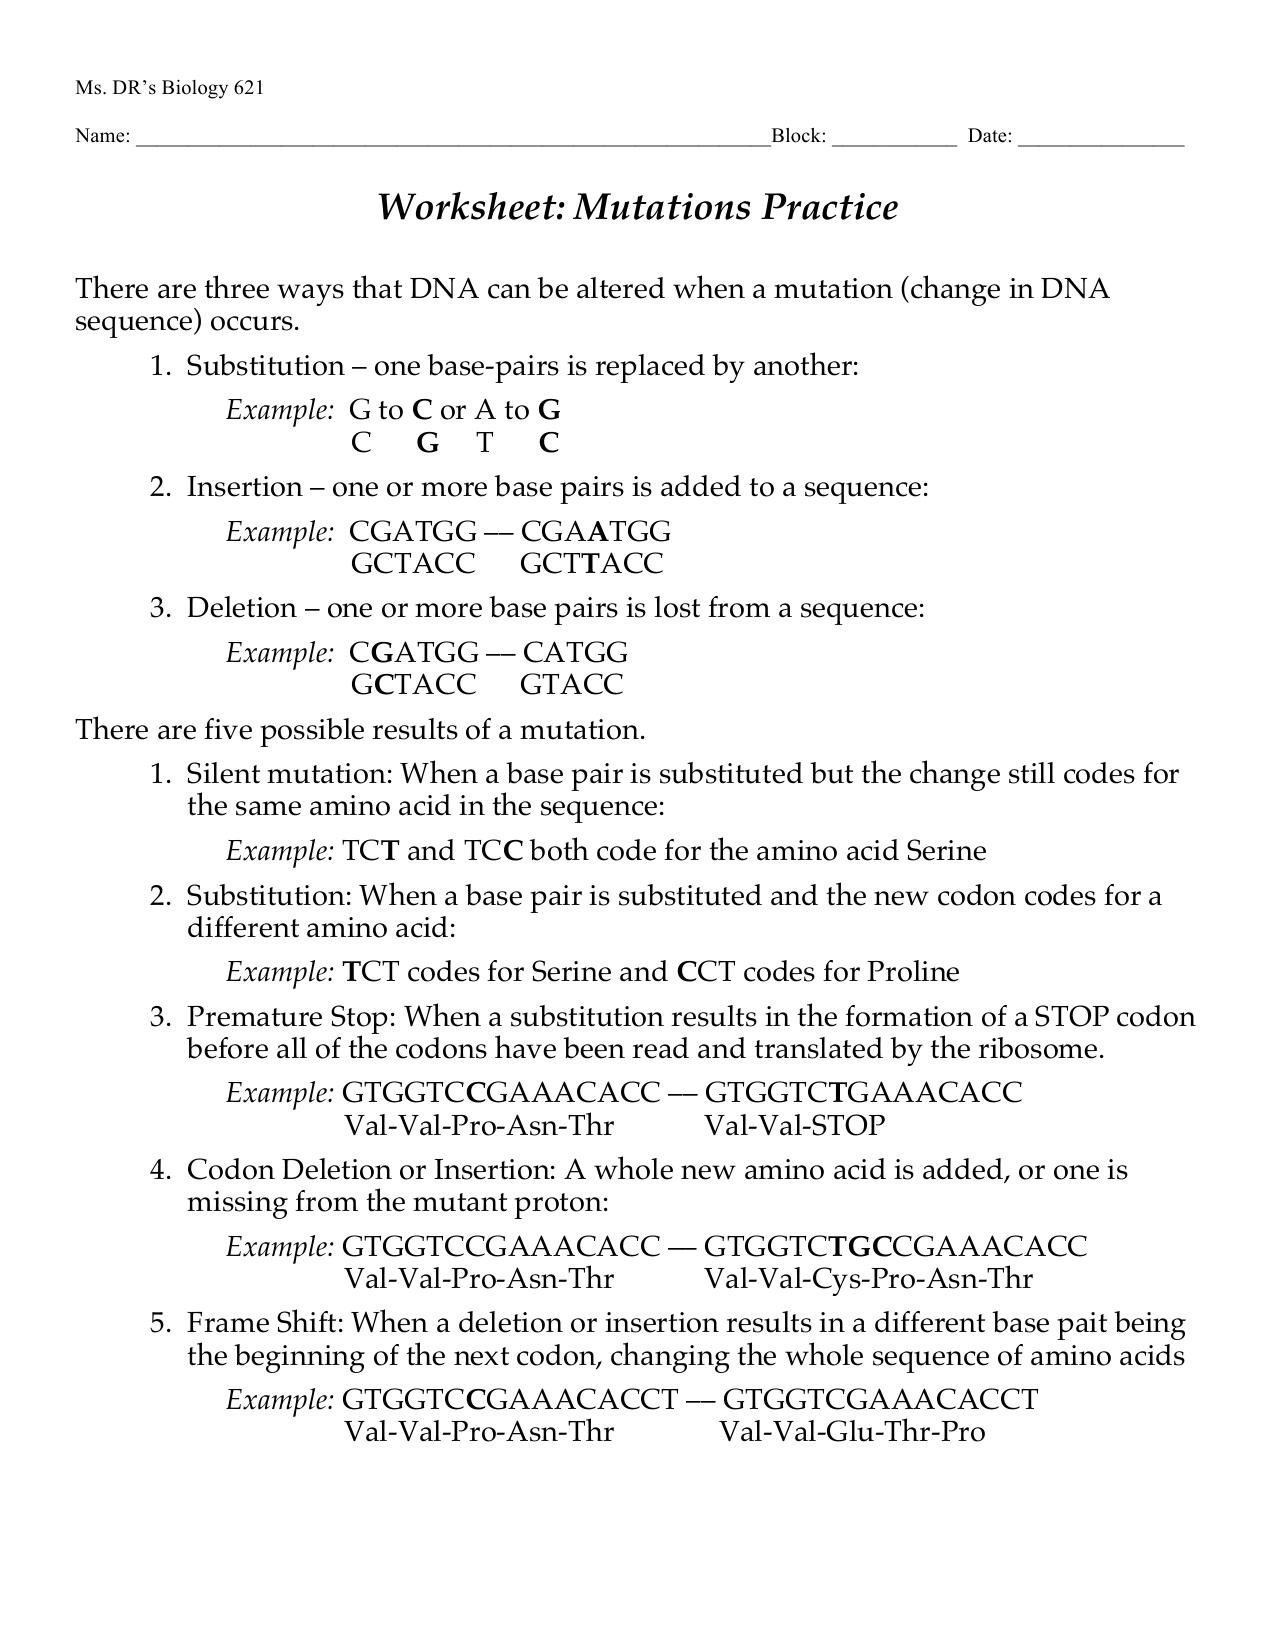 Worksheet Mutations Practice